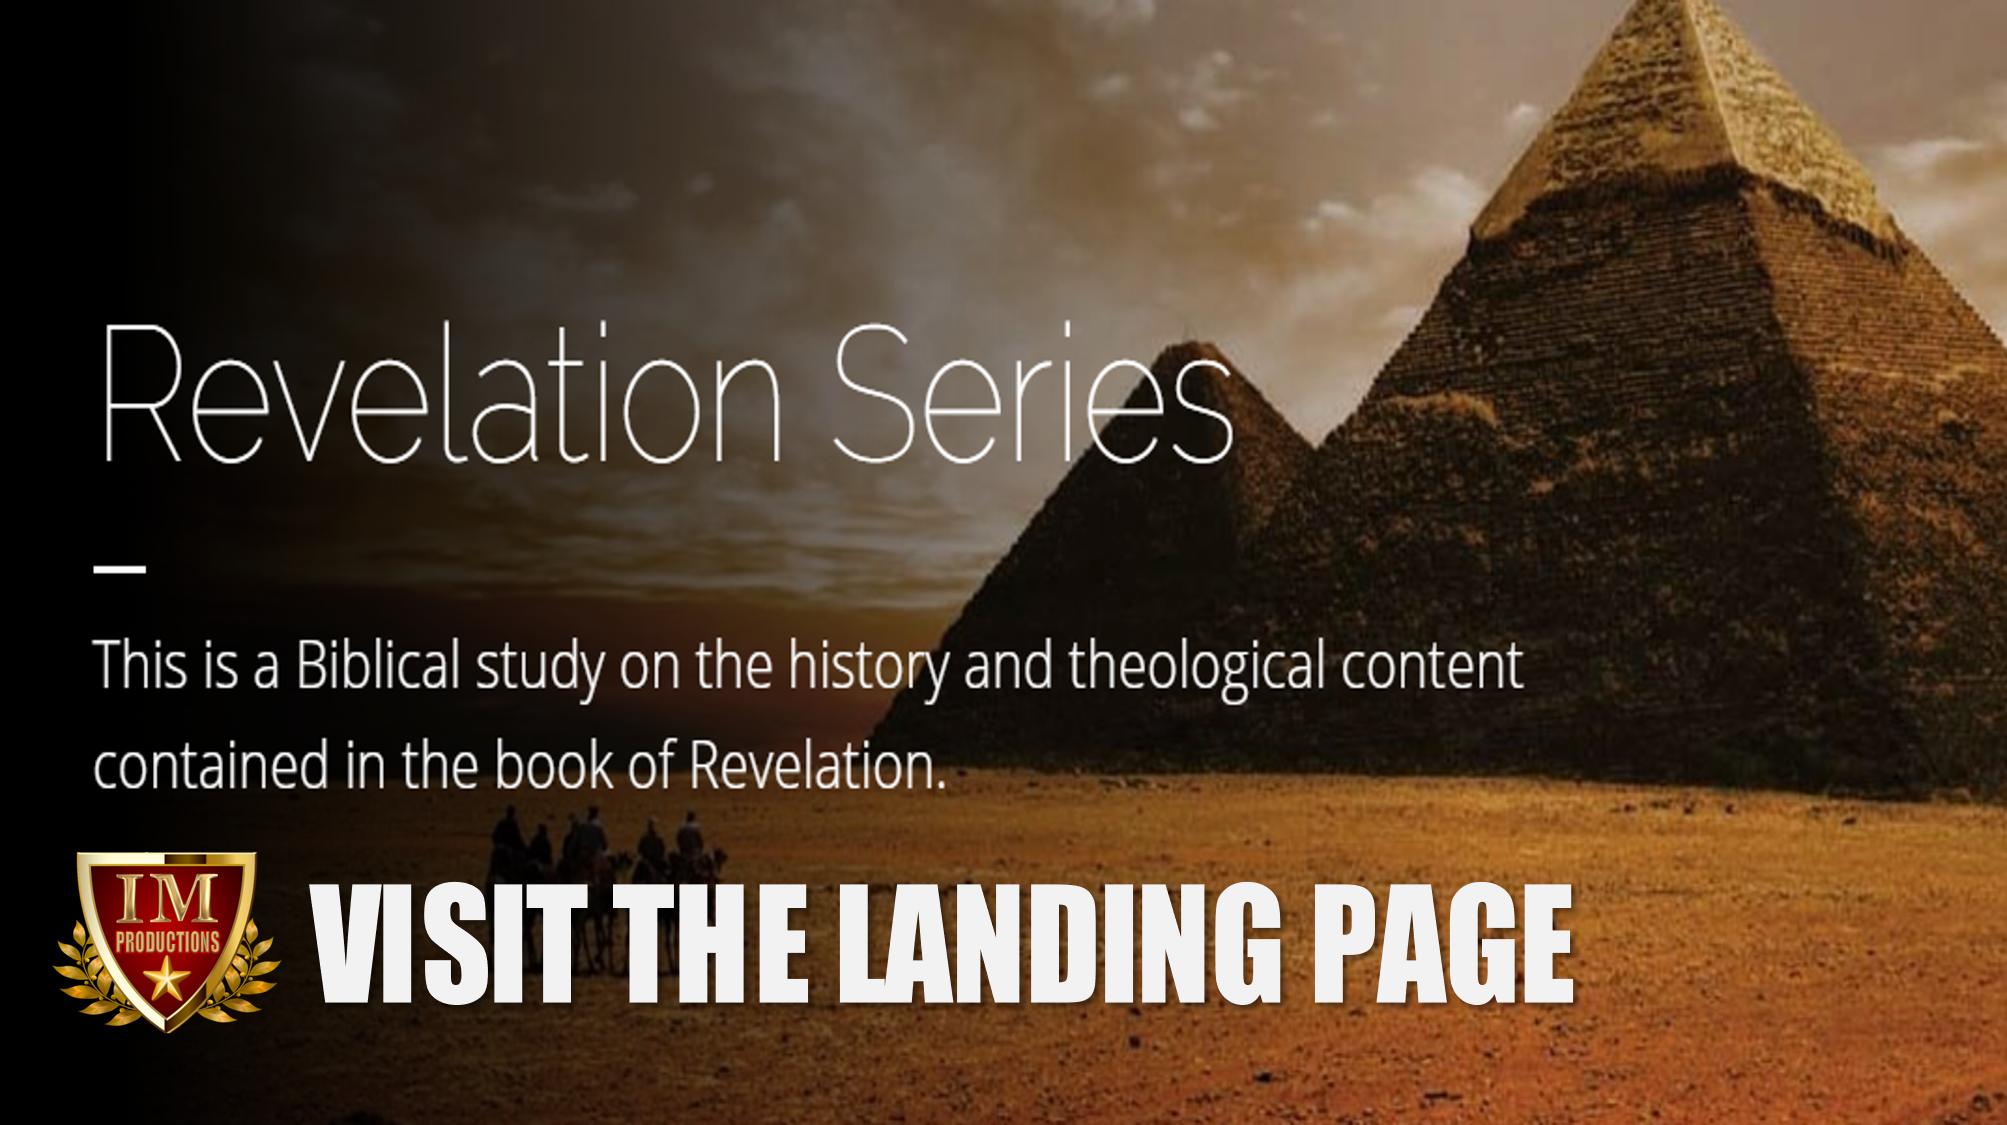 Book of Revelation Series